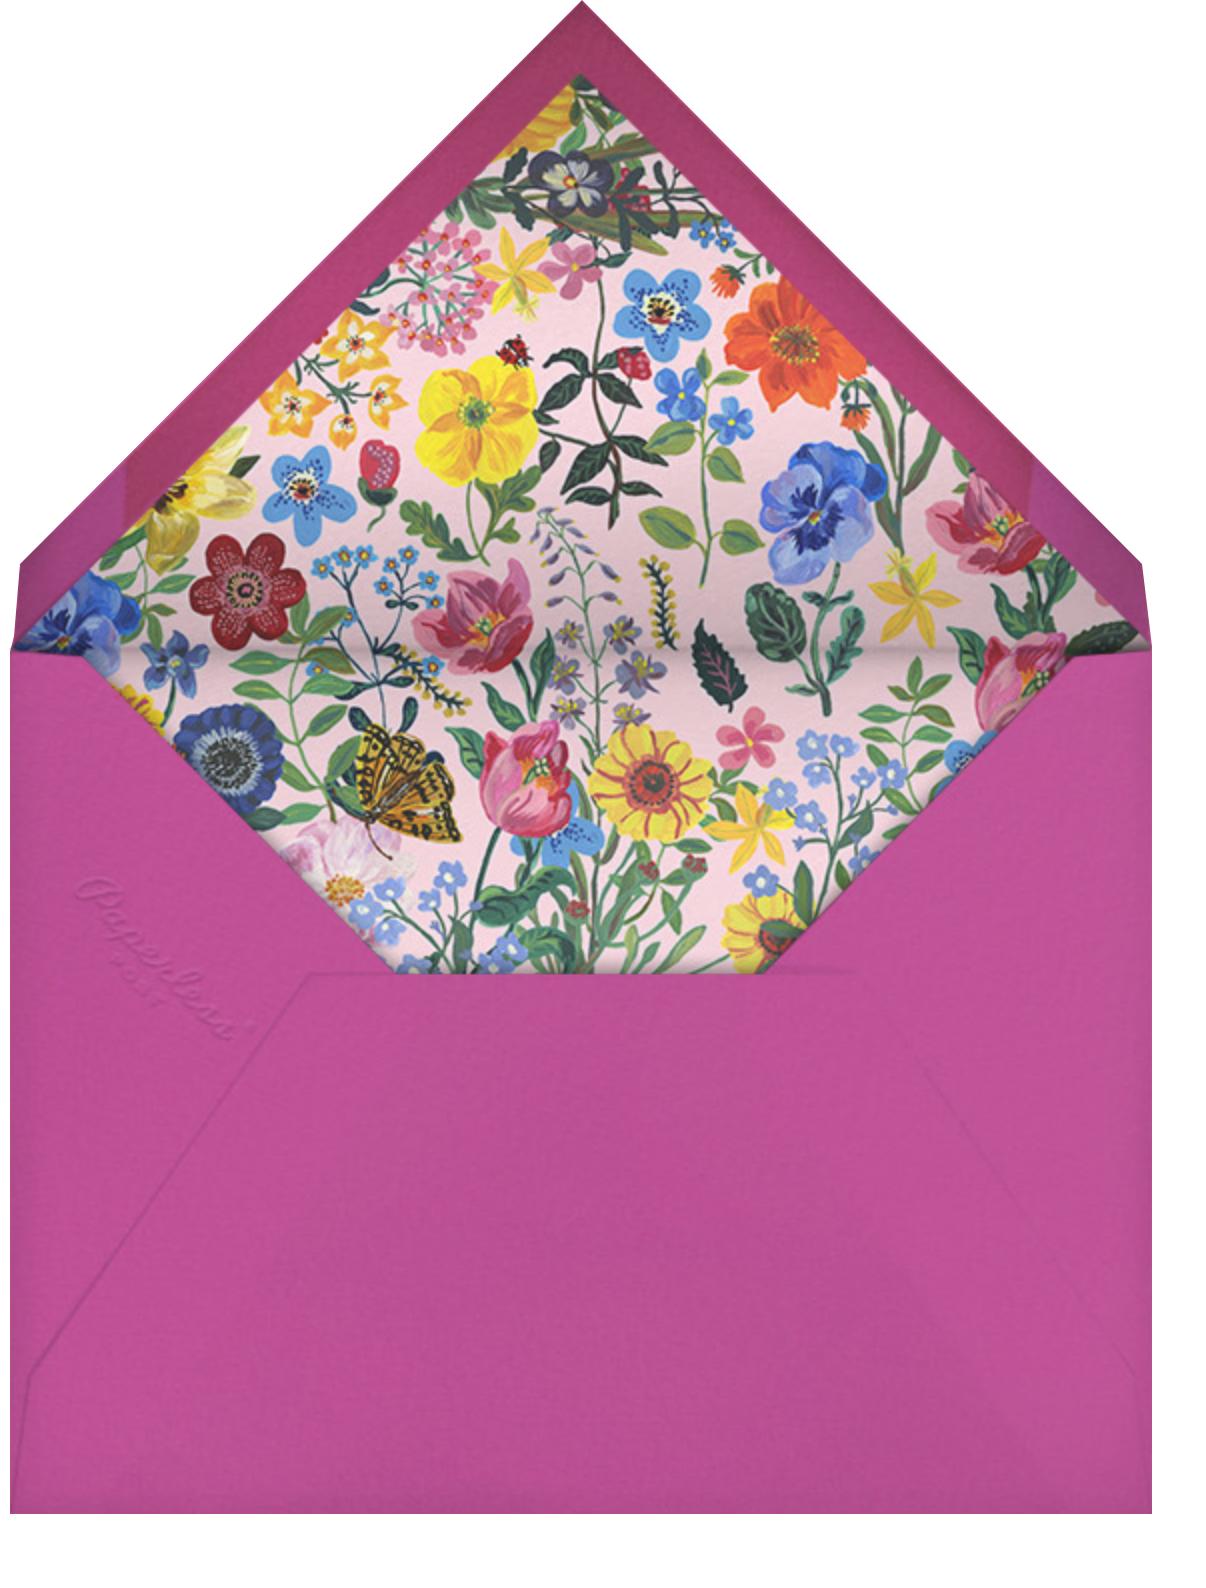 Printemps - Nathalie Lété - Woodland baby shower invitations - envelope back